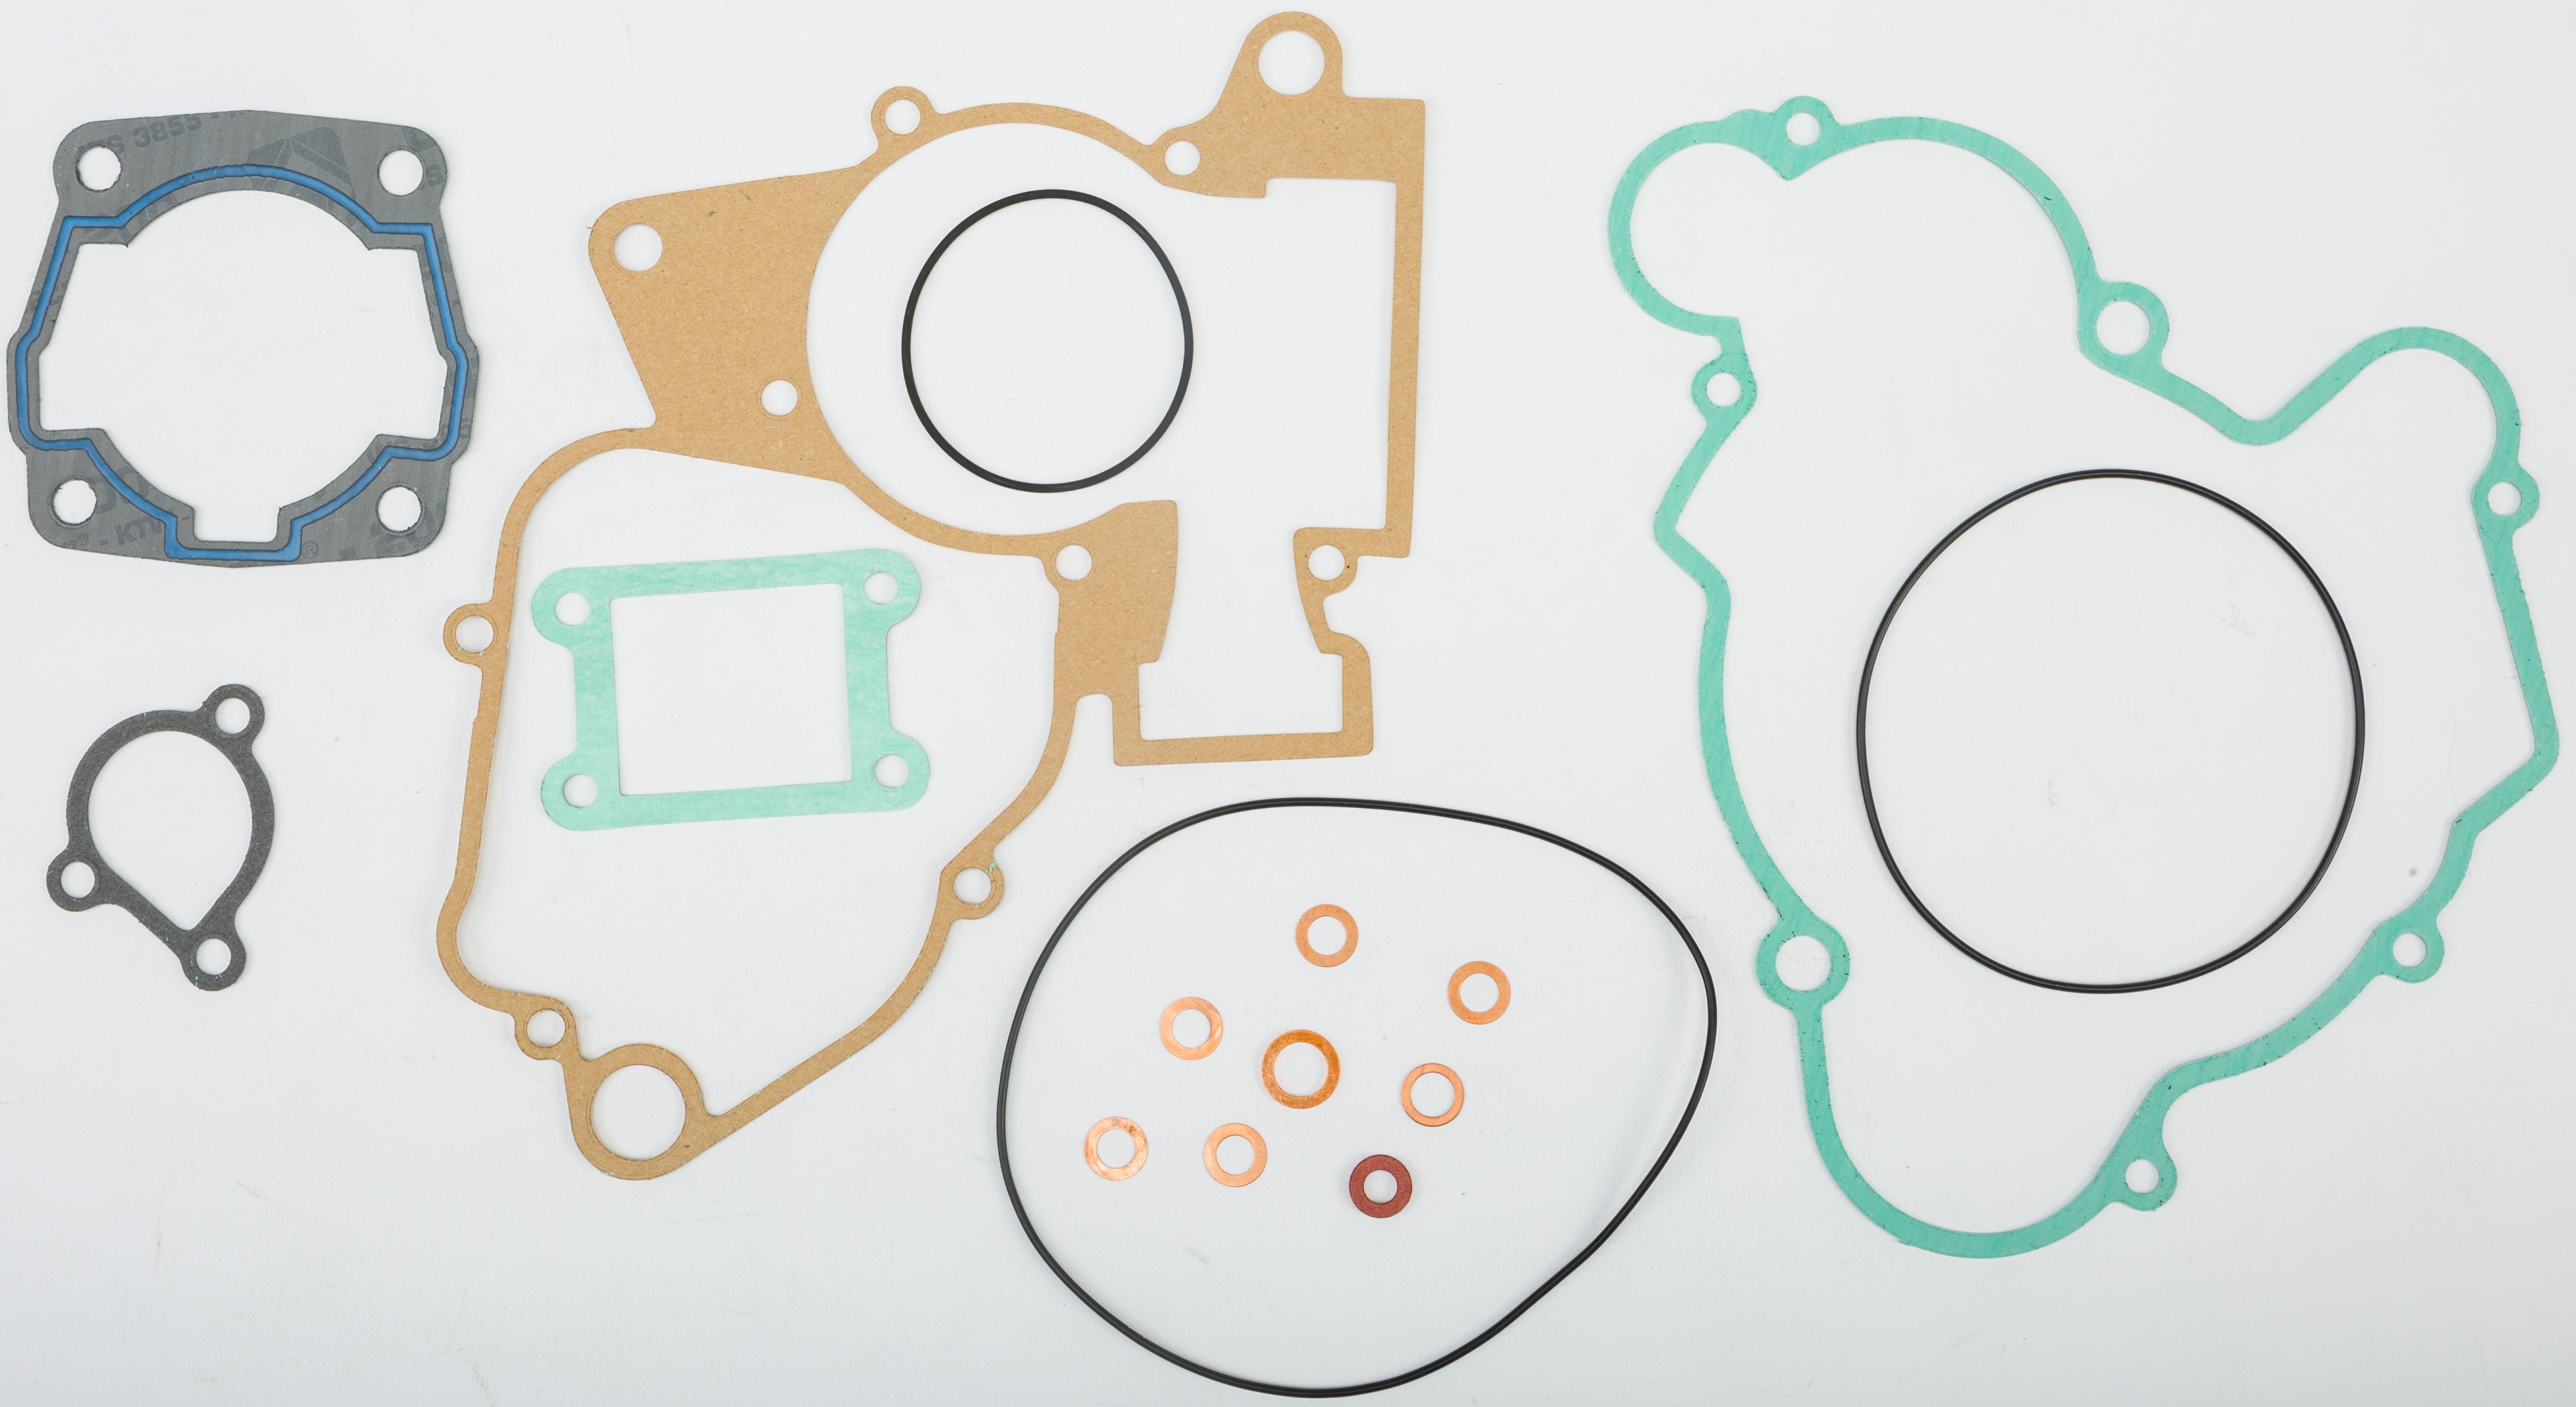 Manguera para ducha cobre, 150 cm, rosca de metal de 1//2, revestimiento s/ólido Brauseschl/äuche